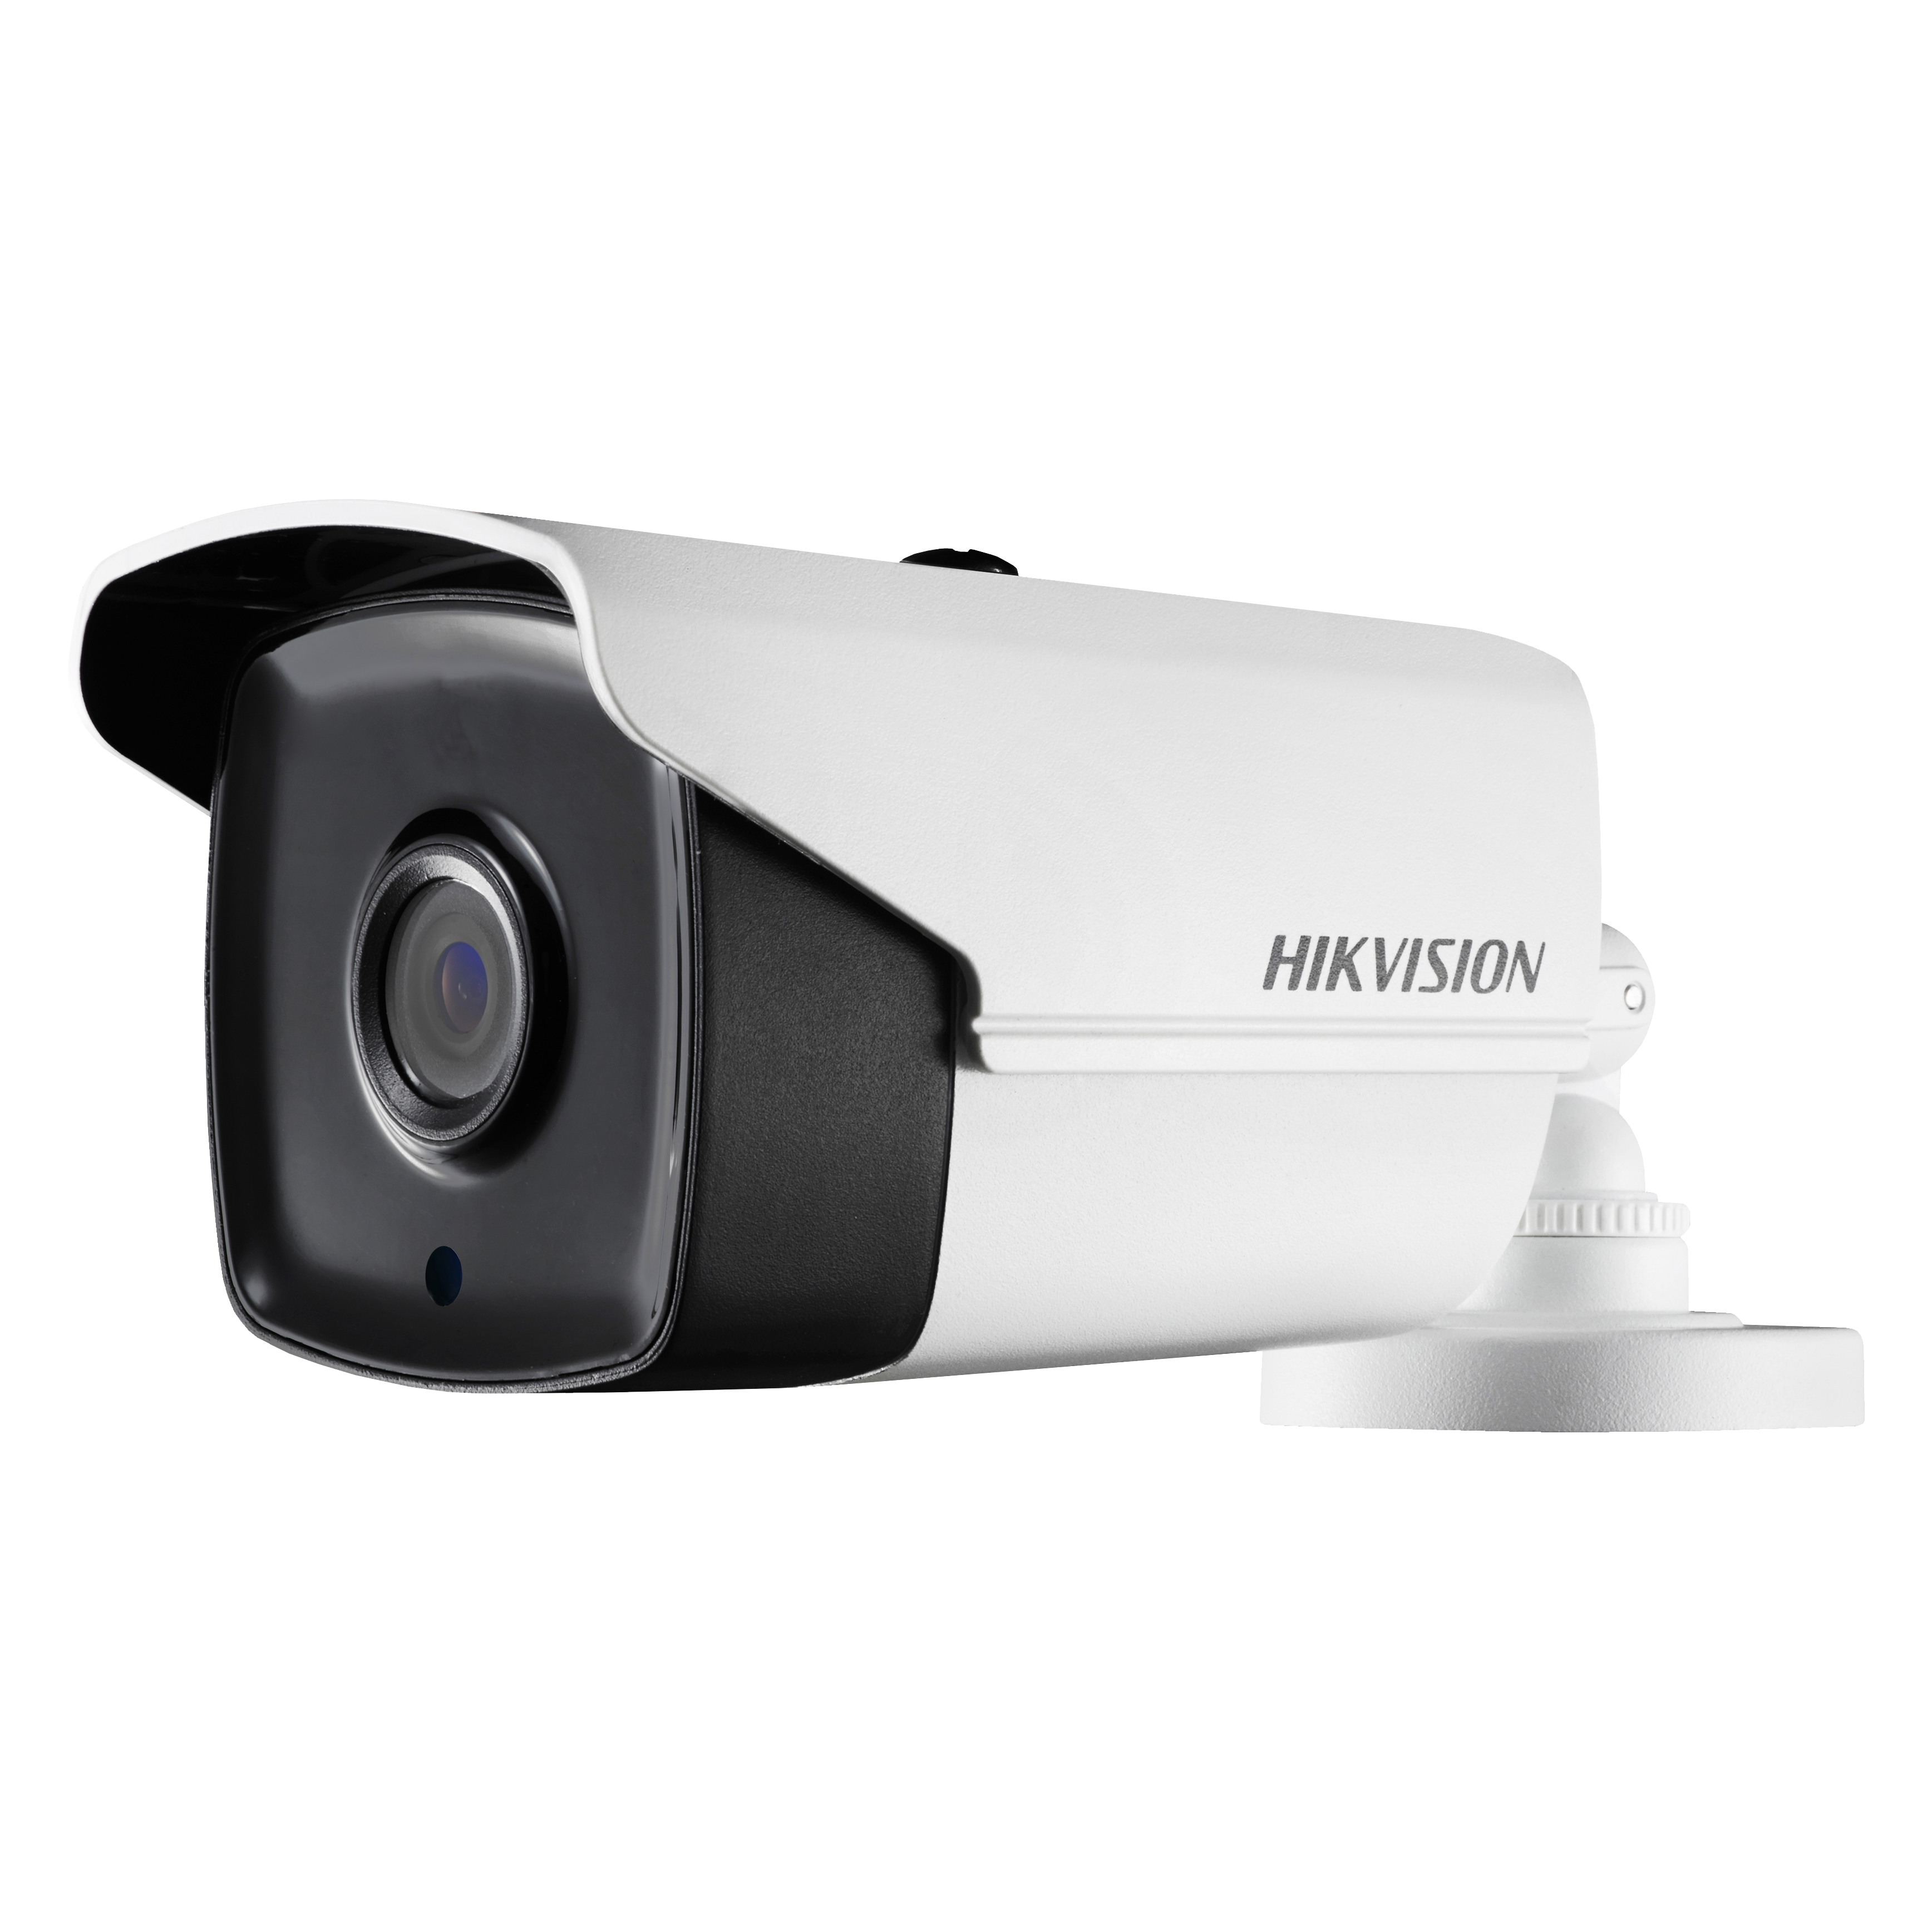 https://0501.nccdn.net/4_2/000/000/050/773/hikvision-ds-2ce16f7t-it-3mp-wdr-exir-bullet-camera.png